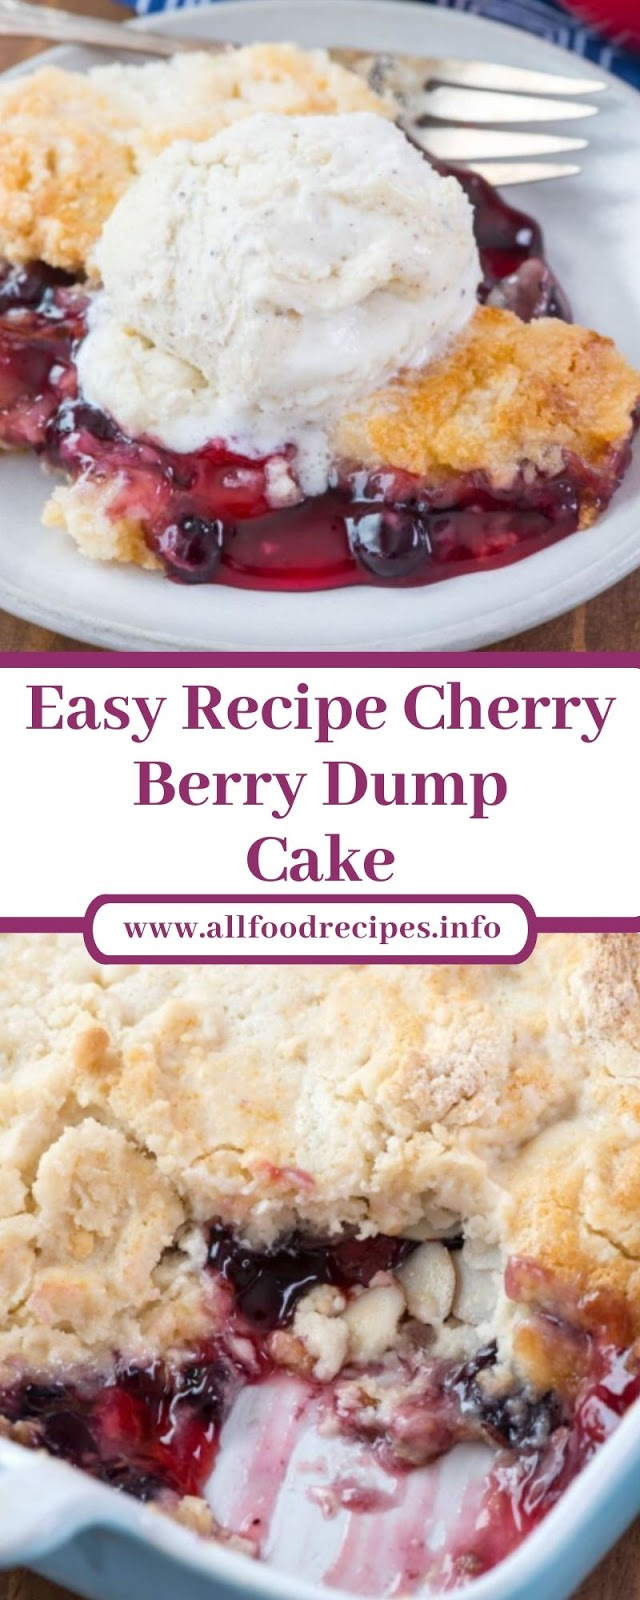 Easy Recipe Cherry Berry Dump Cake